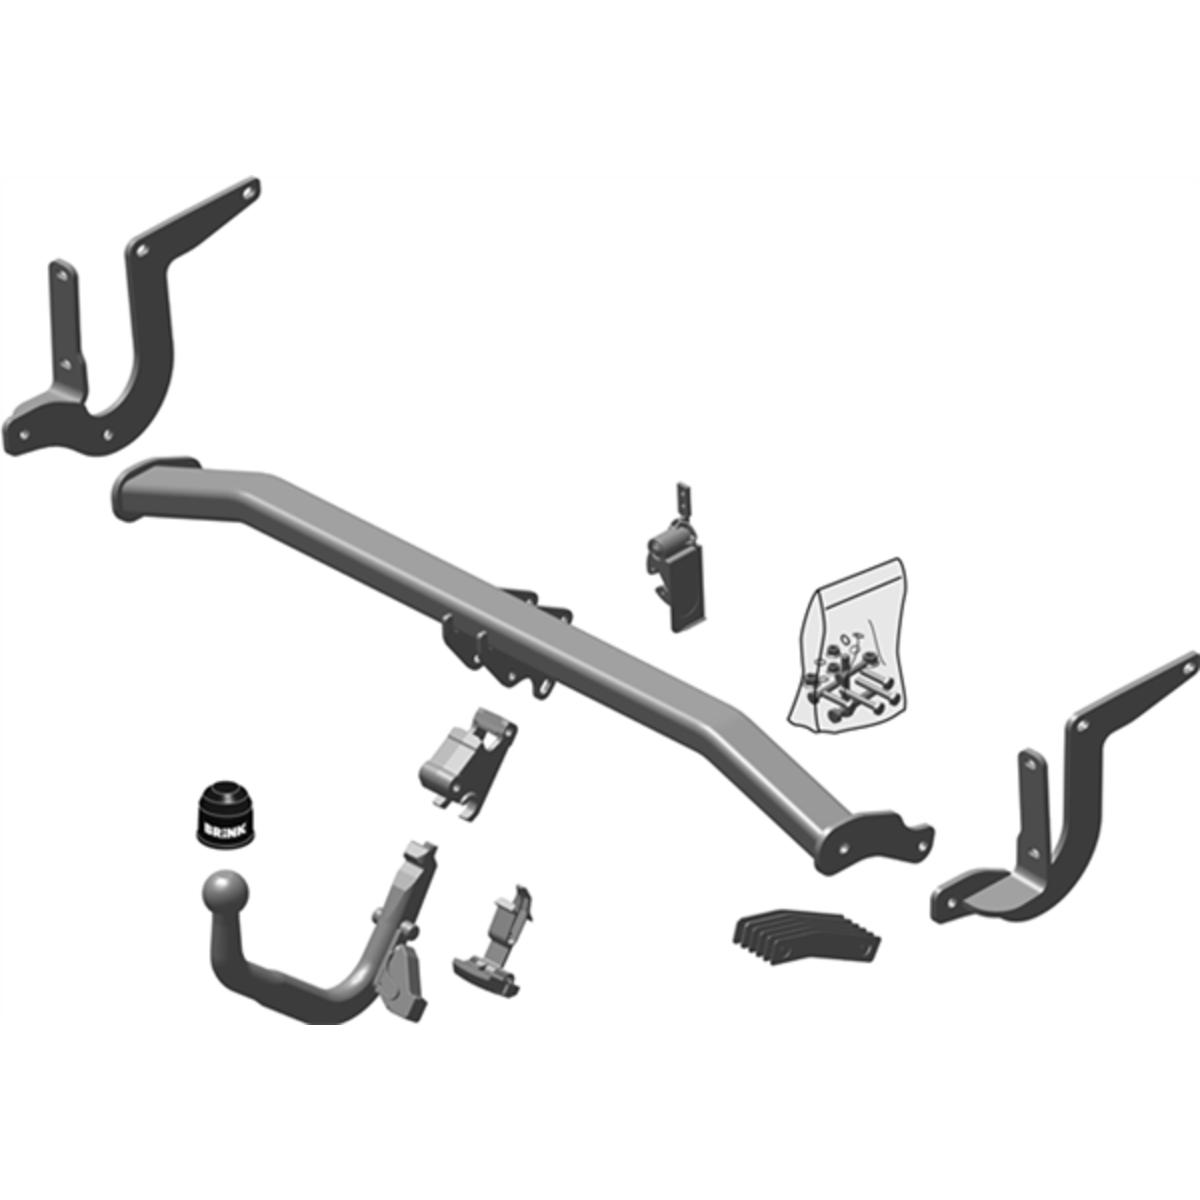 Brink Towbar to suit Peugeot 308 (01/2014 - 11/2017)